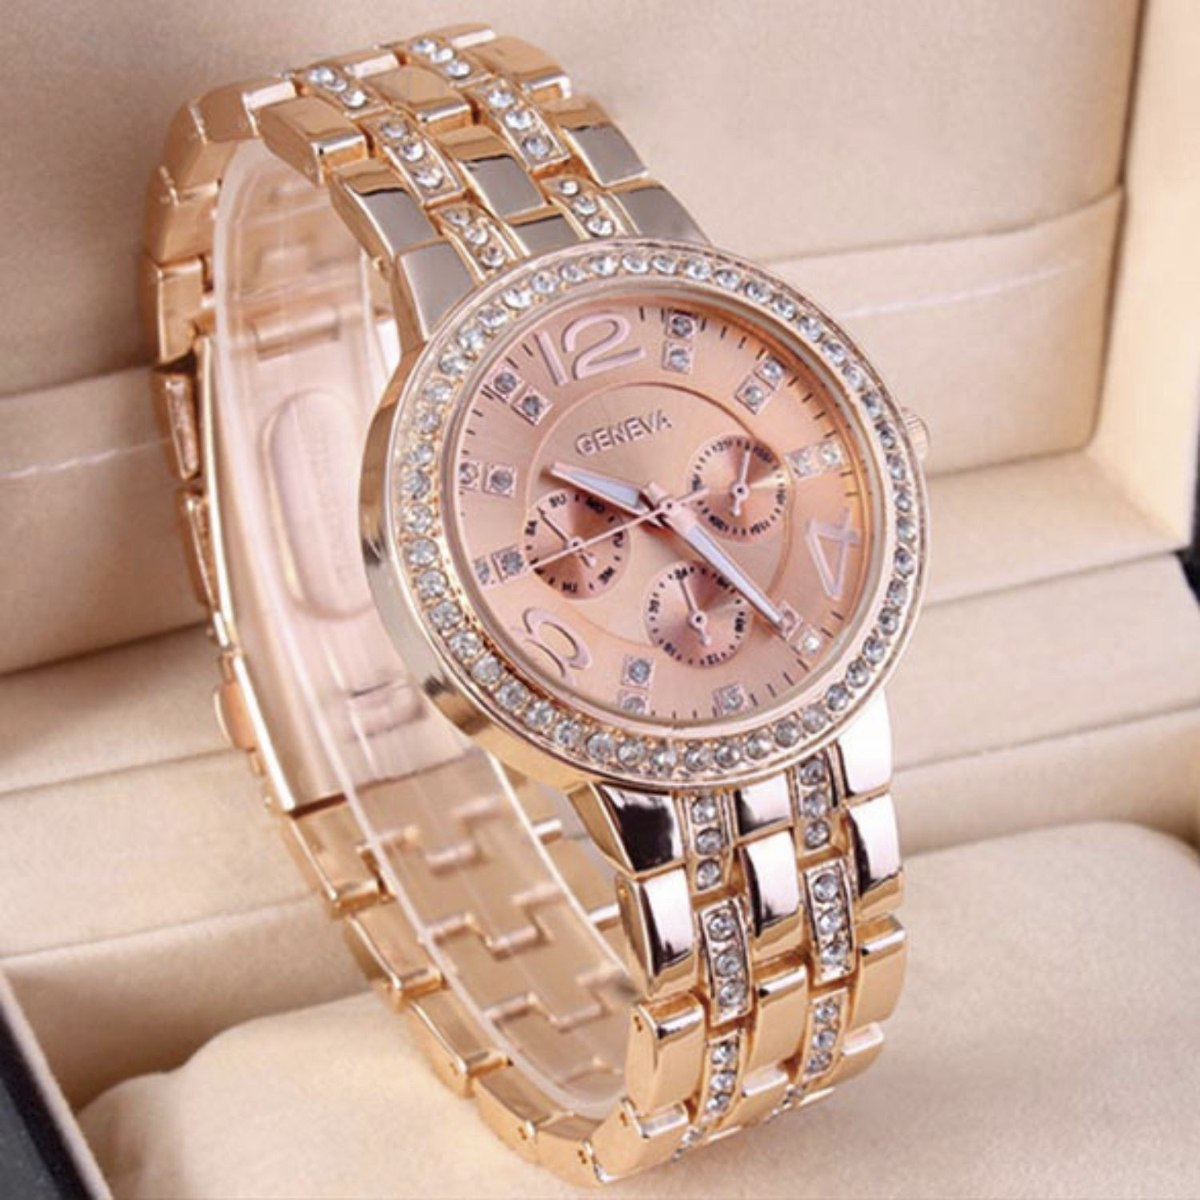 51ad540ed9f Relógio De Pulso Feminino Rose Com Strass Geneva Luxury - R  54